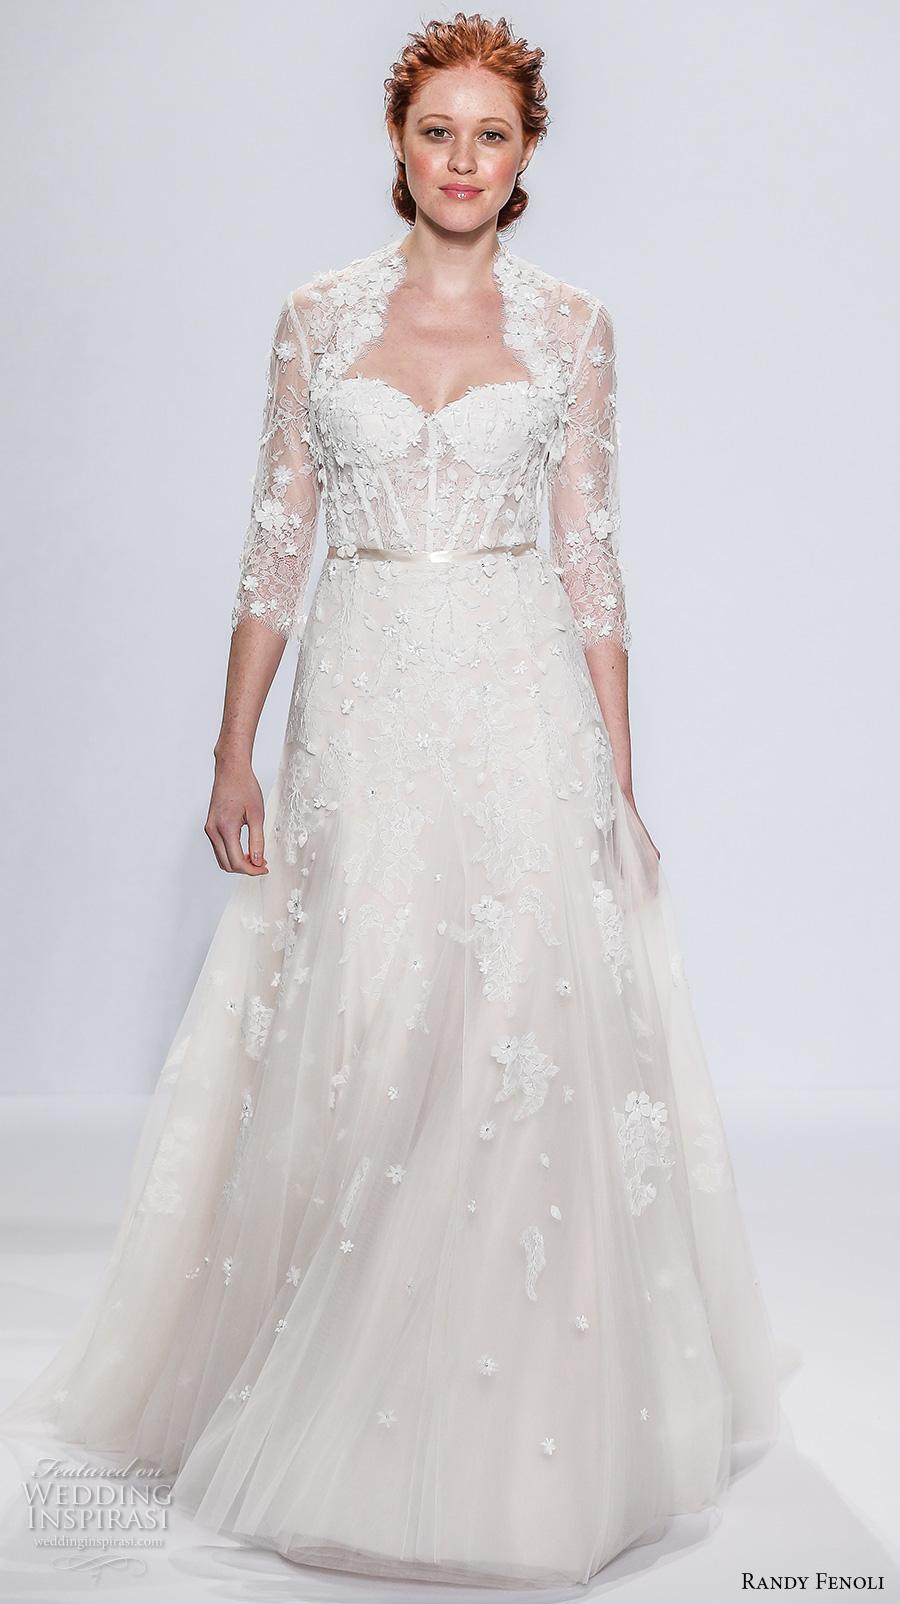 Randy Fenoli Bridal Spring 2018 Wedding Dresses New York